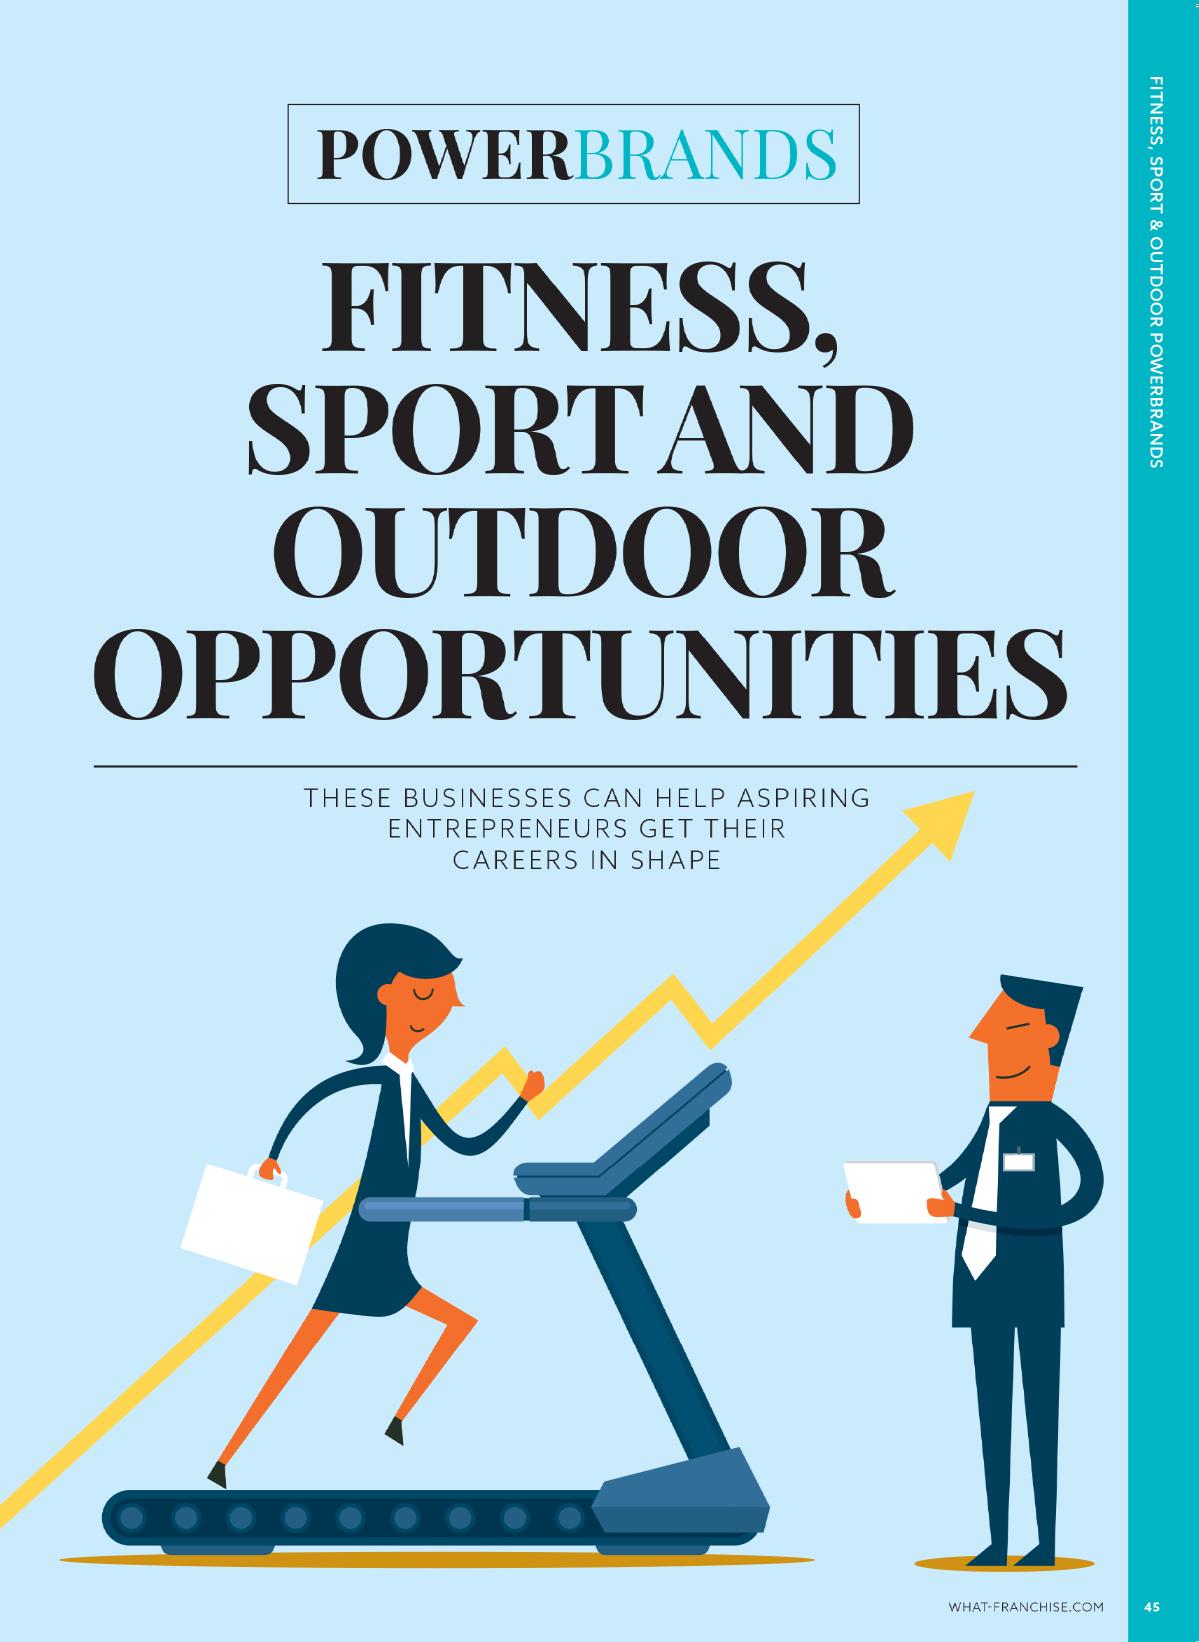 Powerbrands: Fitness, Sport and Outdoor opportunities